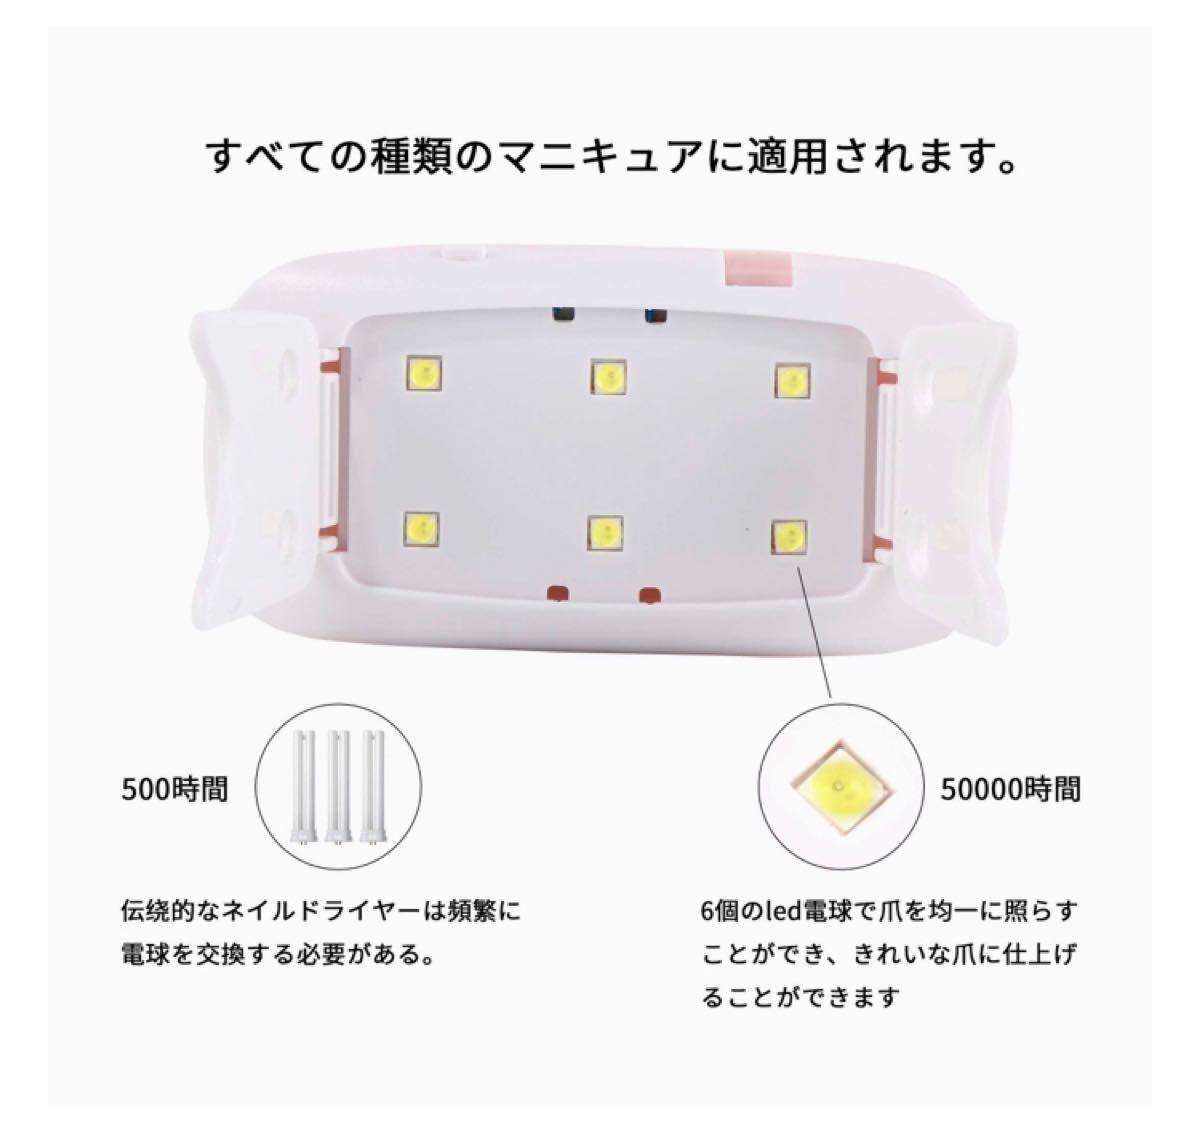 UVライト レジン用 硬化ライト LEDネイルドライヤー タイマー設定可能 UV LEDダブルライト ジェルネイル レジンクラフト